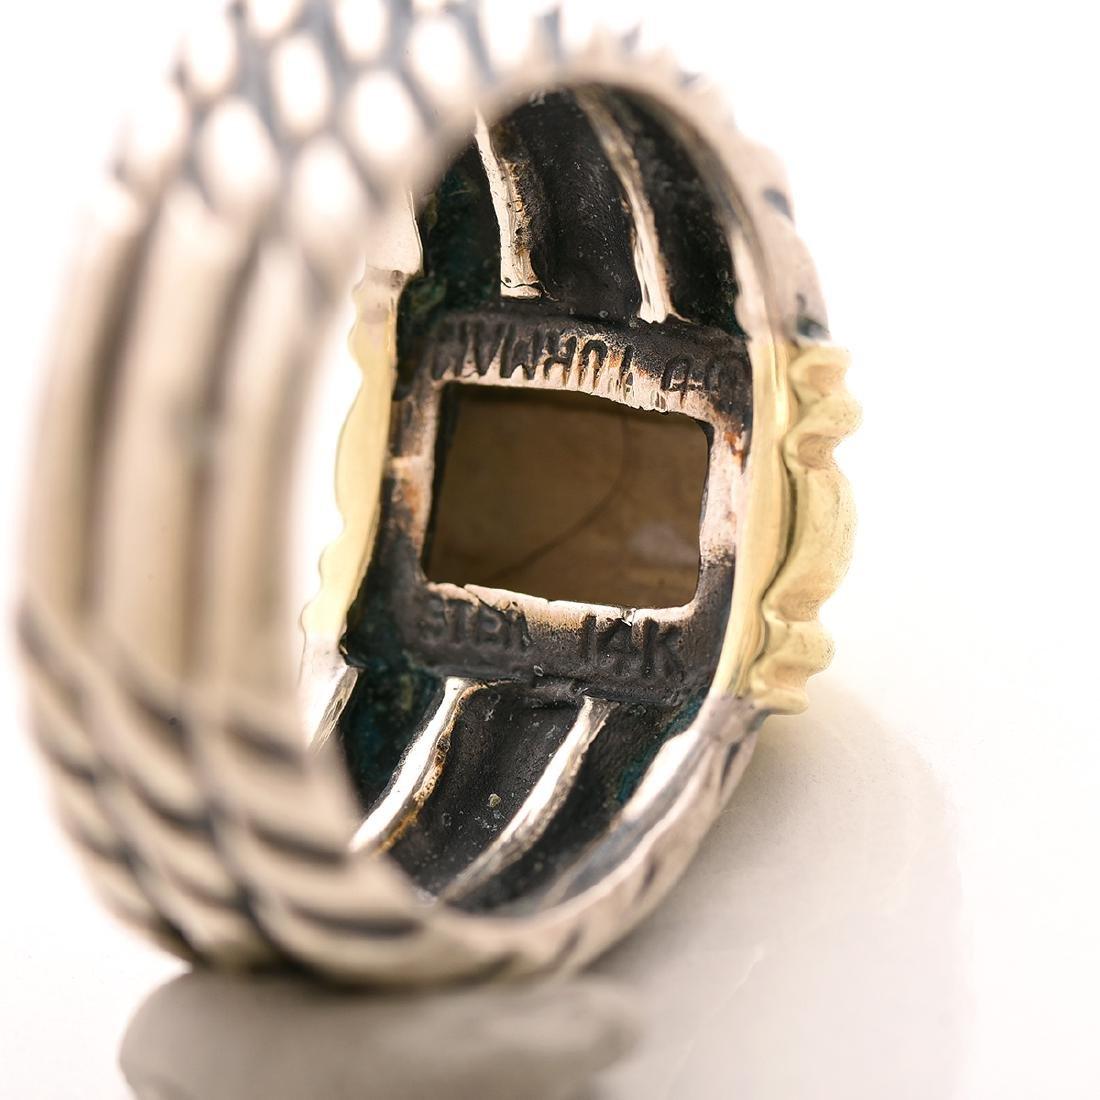 David Yurman, 14k Gold, Sterling Silver Jewelry Suite. - 7